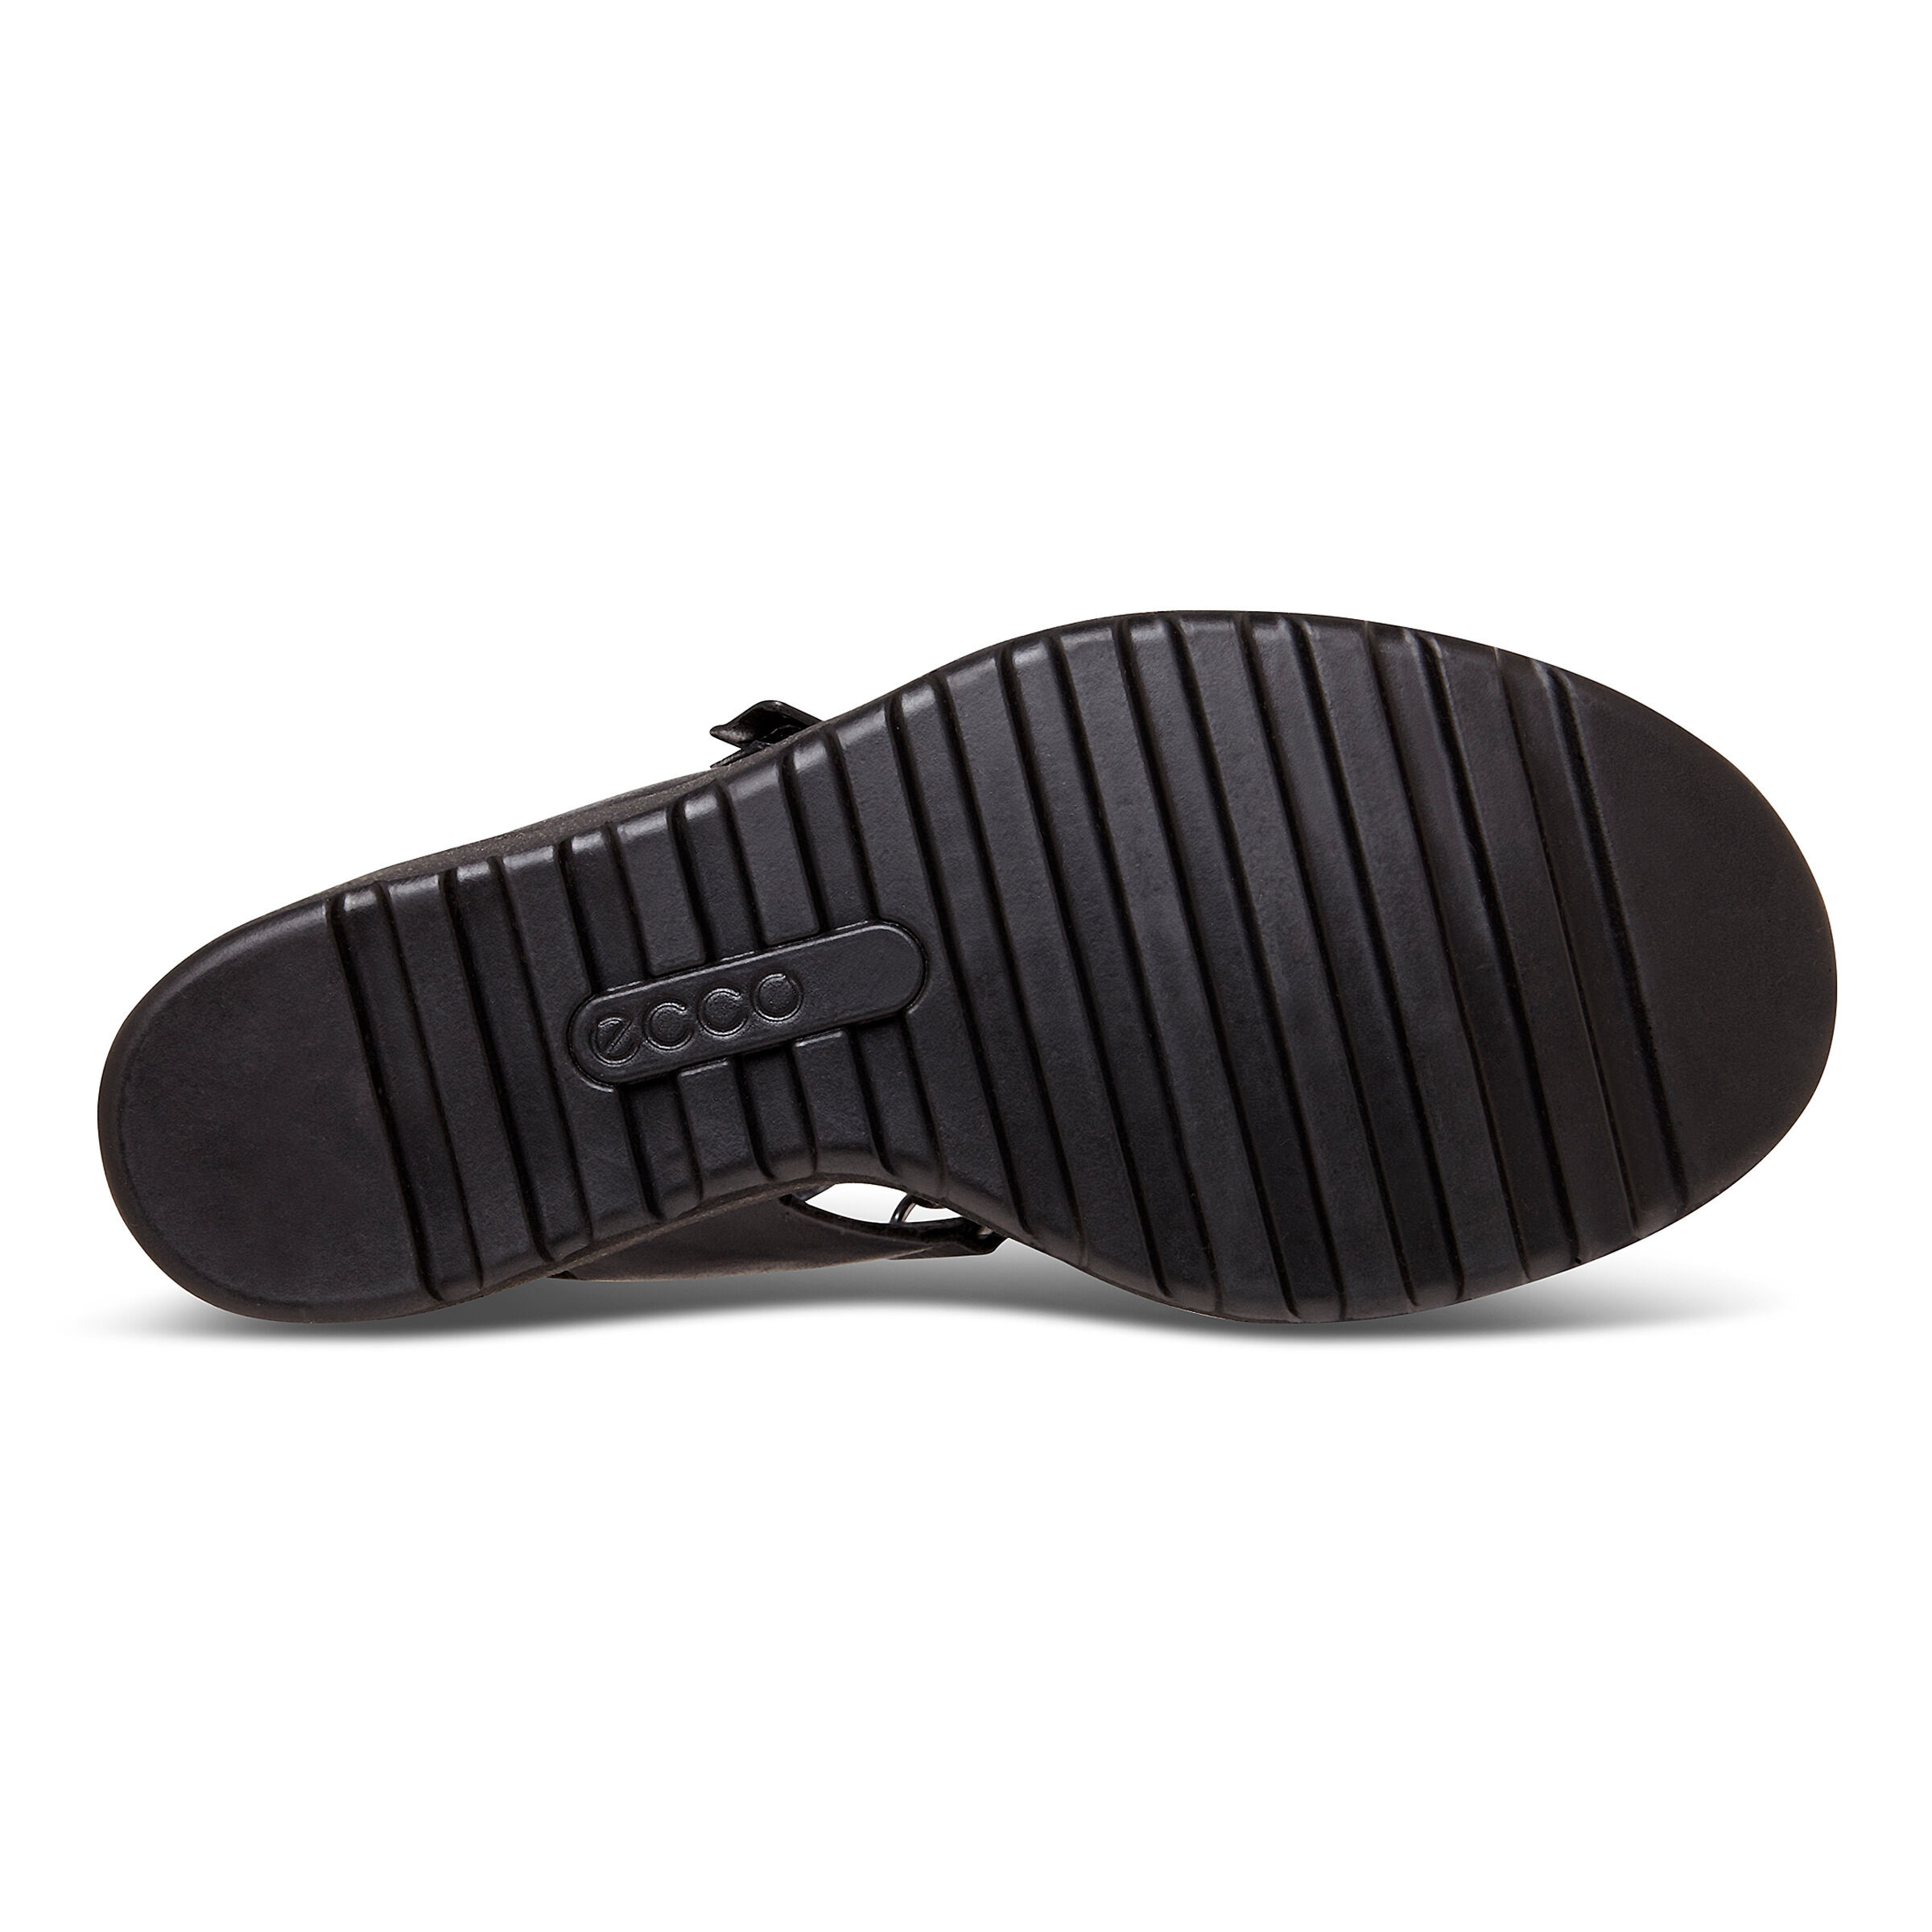 ECCO Freja Wedge Strap Sandal | Women's Sandals | ECCO® Shoes